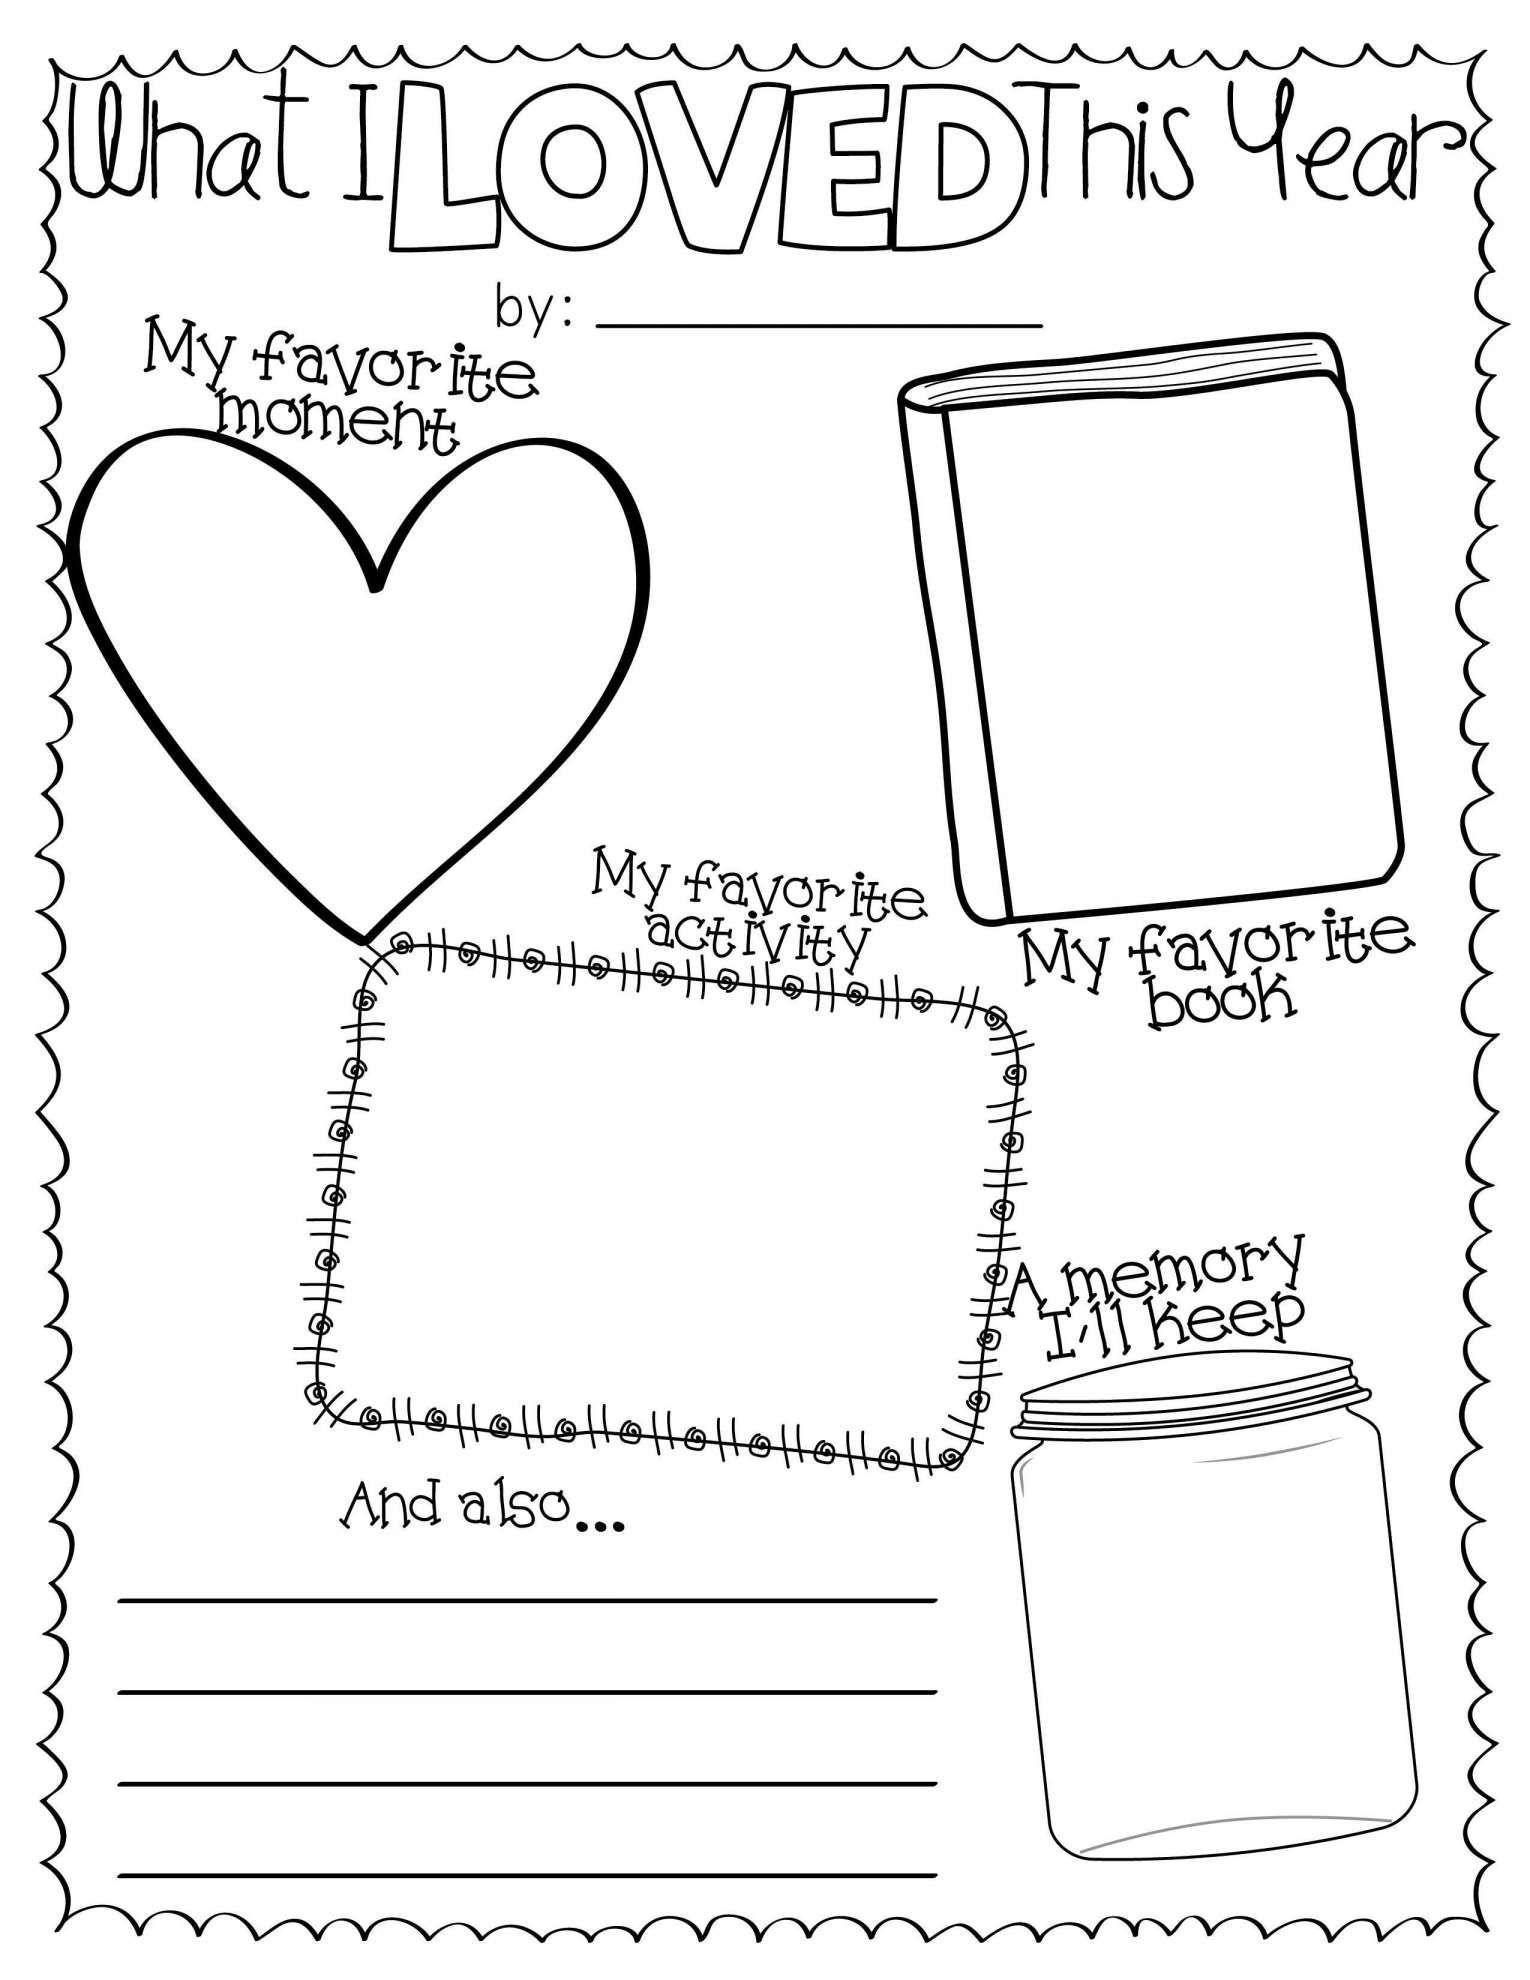 17 End Of The Year Worksheets 5th Grade End Of Year Activities School Worksheets Kindergarten Worksheets Printable [ 1980 x 1530 Pixel ]